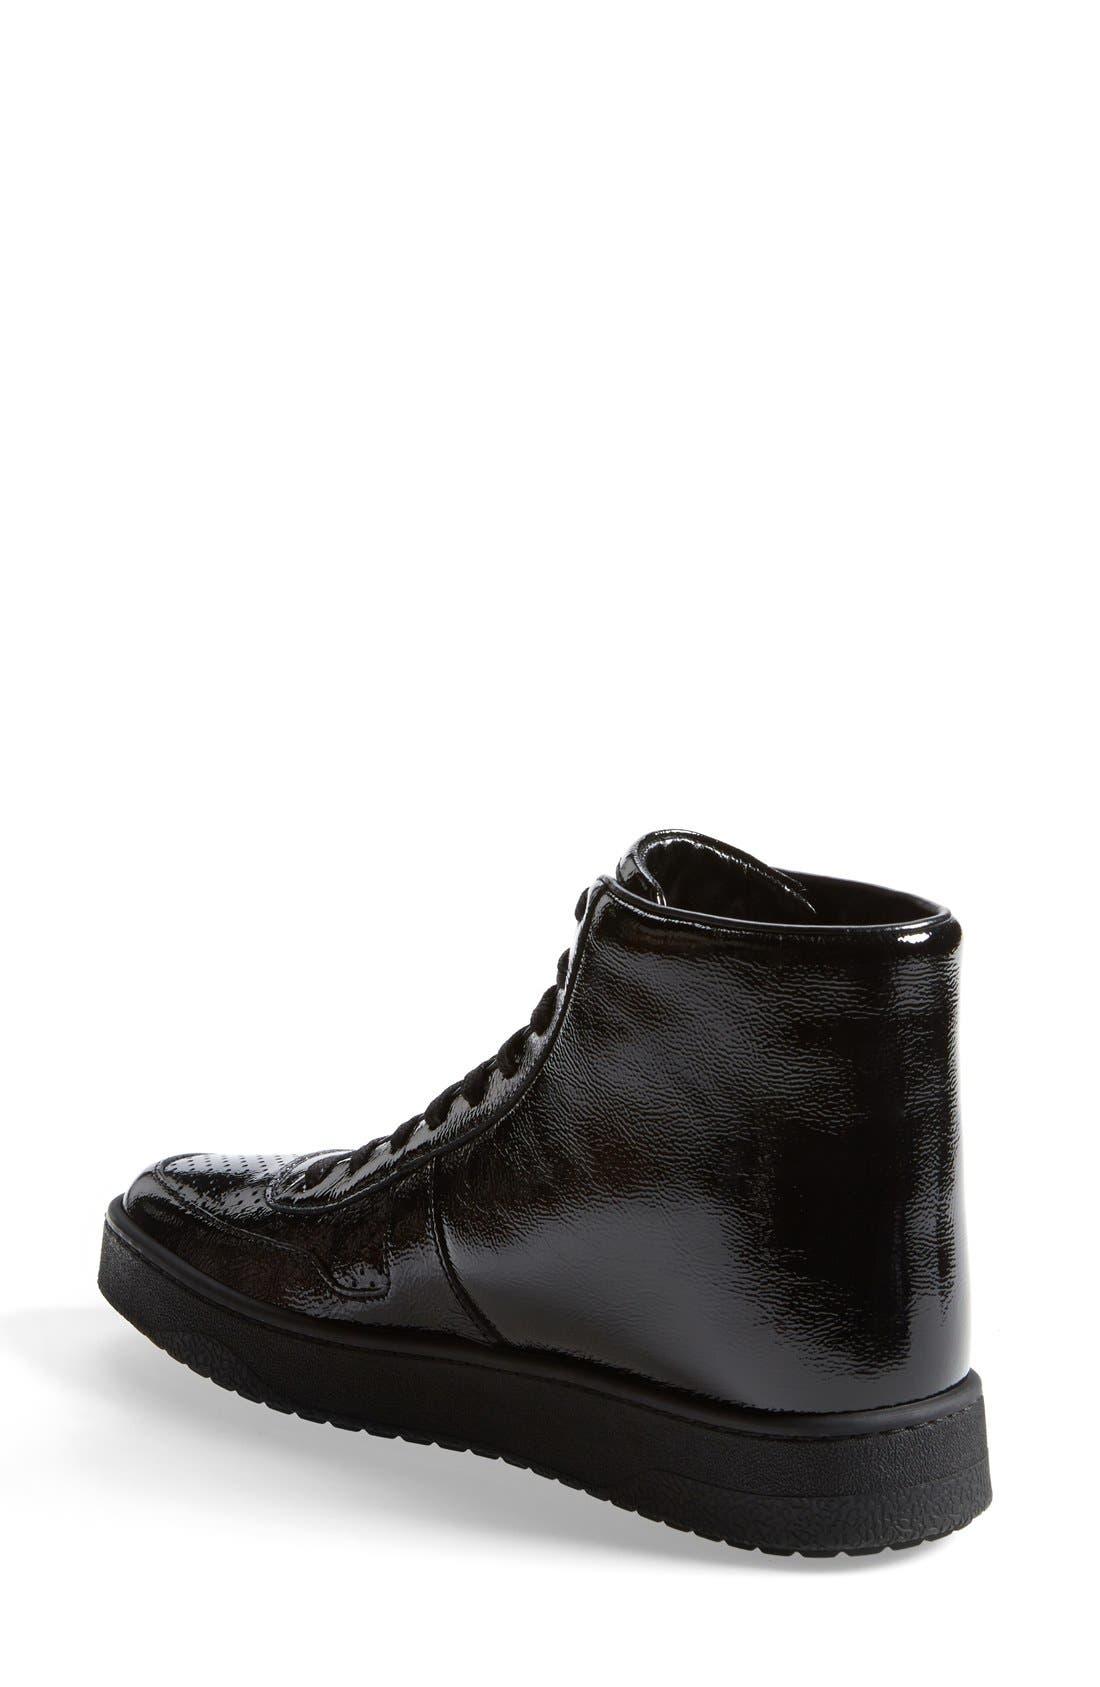 Alternate Image 2  - Gucci 'Soho' High Top Sneaker (Women)